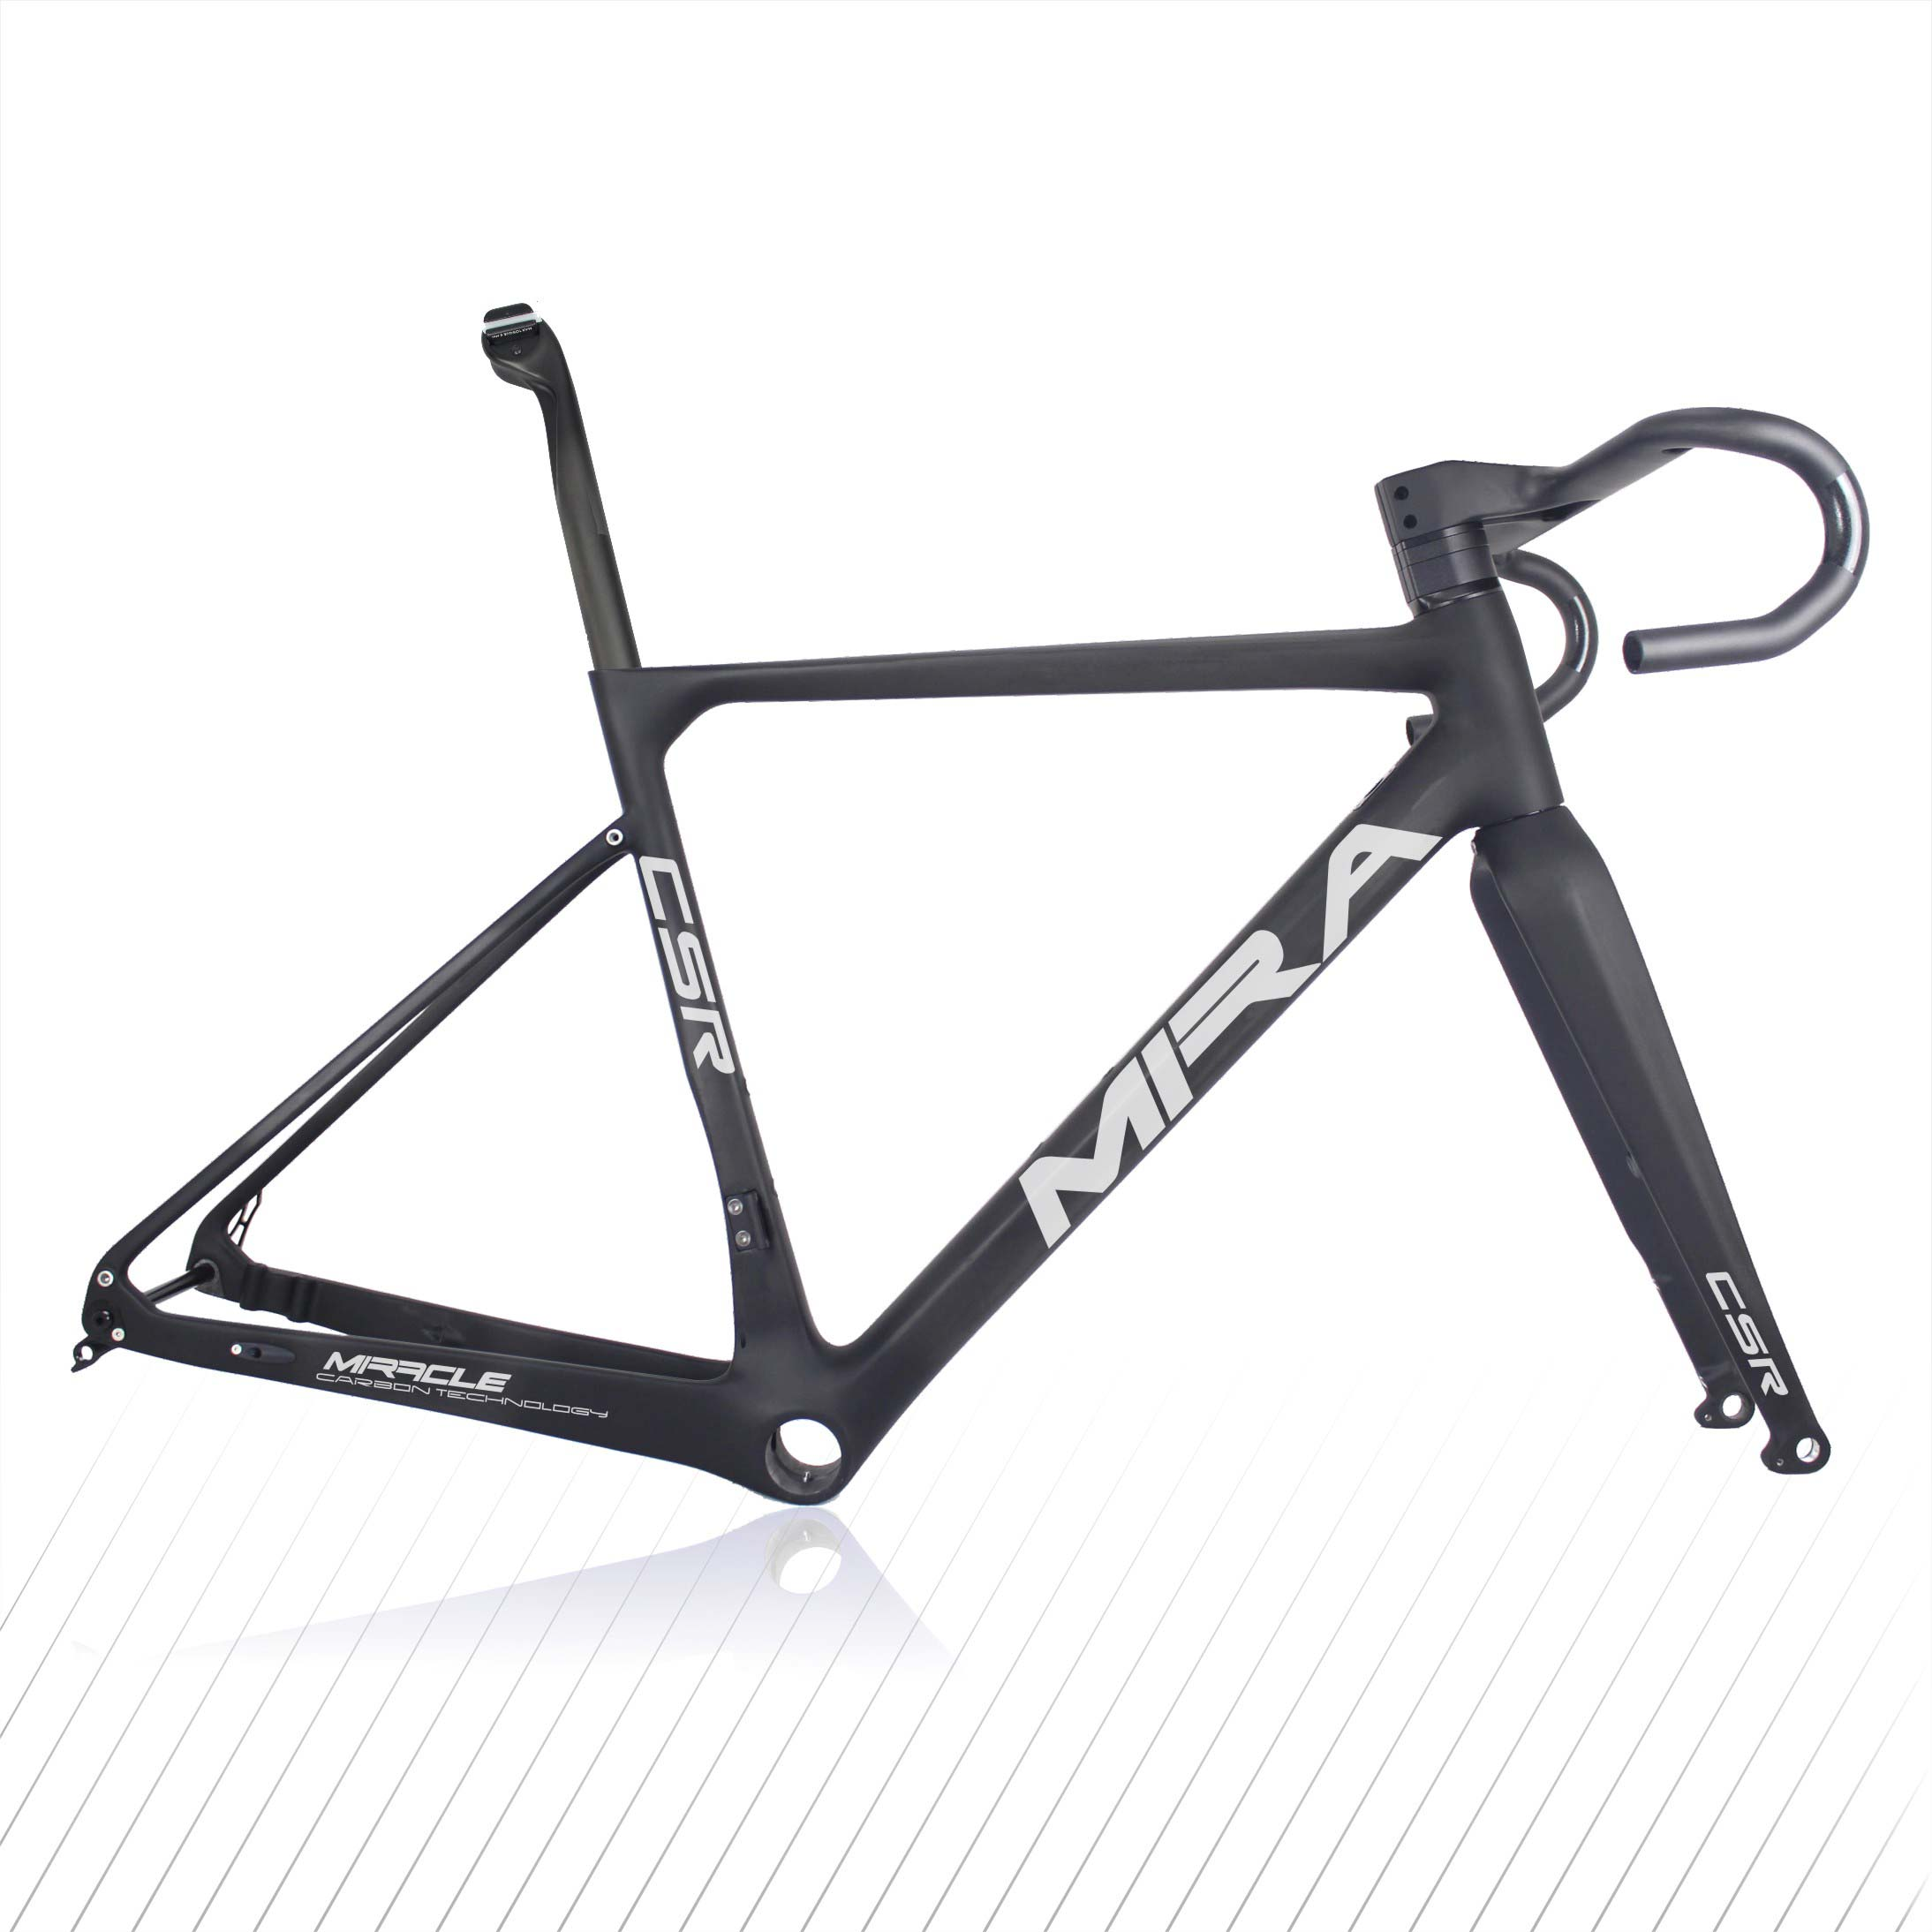 High Quantity Carbon Gravel Frame Cyclocross Frameset T1000 Carbon Bike Frame Disc Brake GR039